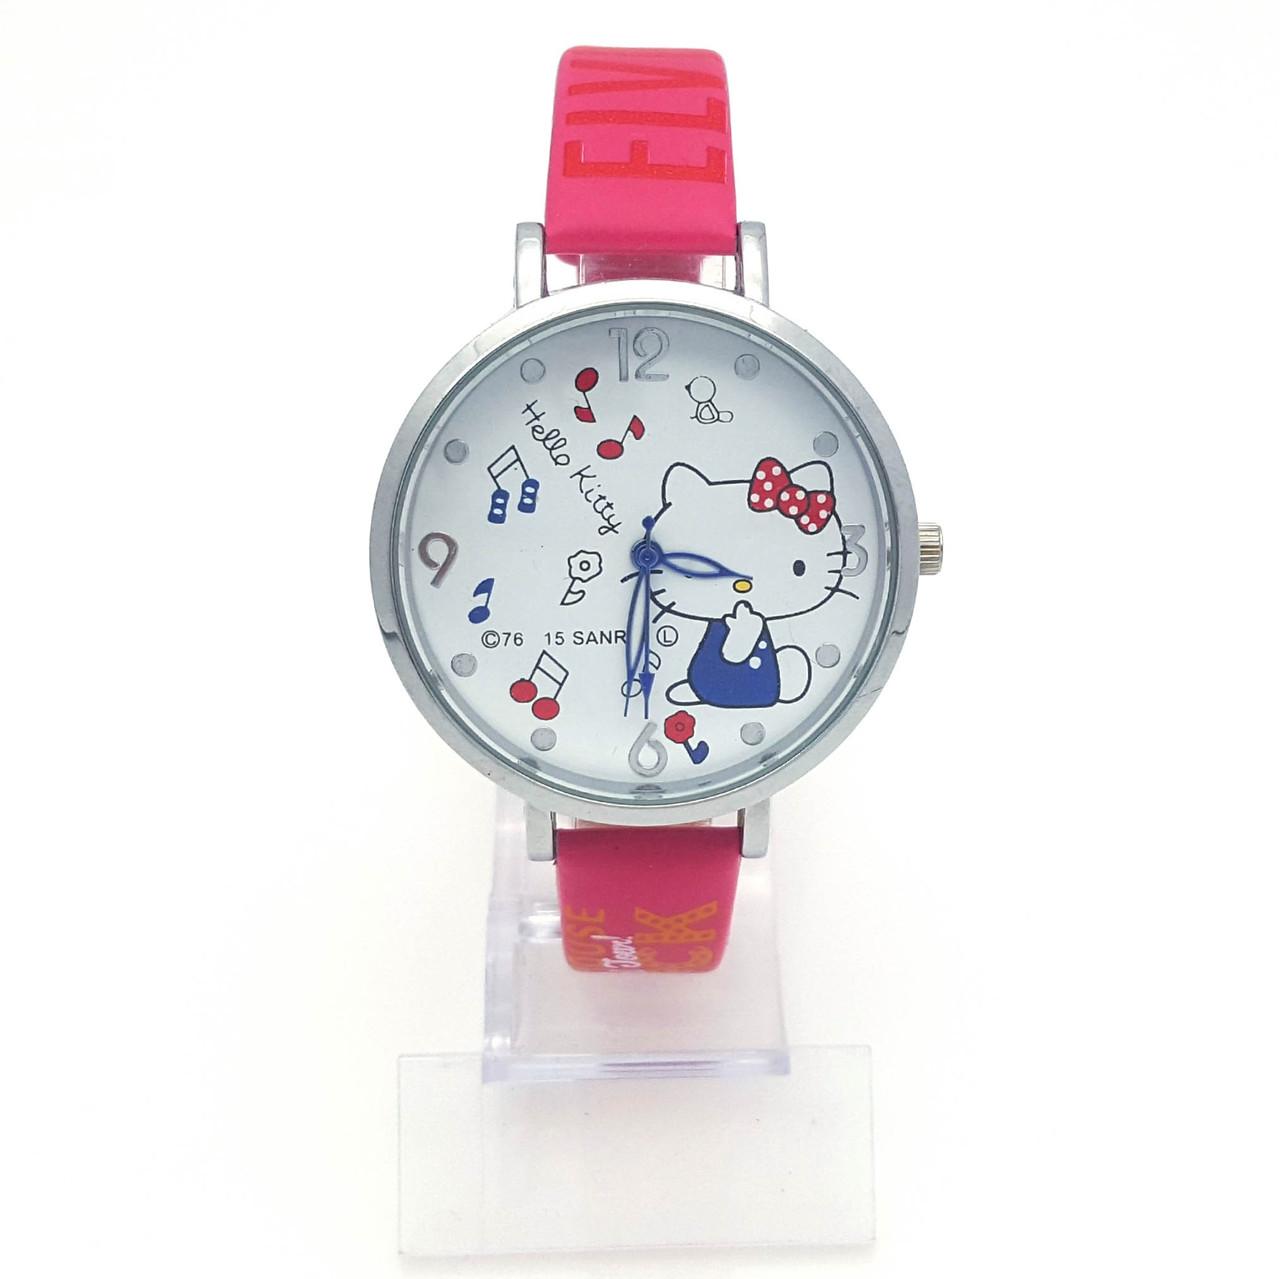 Часы на малиновом ремешке, с Котенком, длина ремешка 17-21см, циферблат 40мм